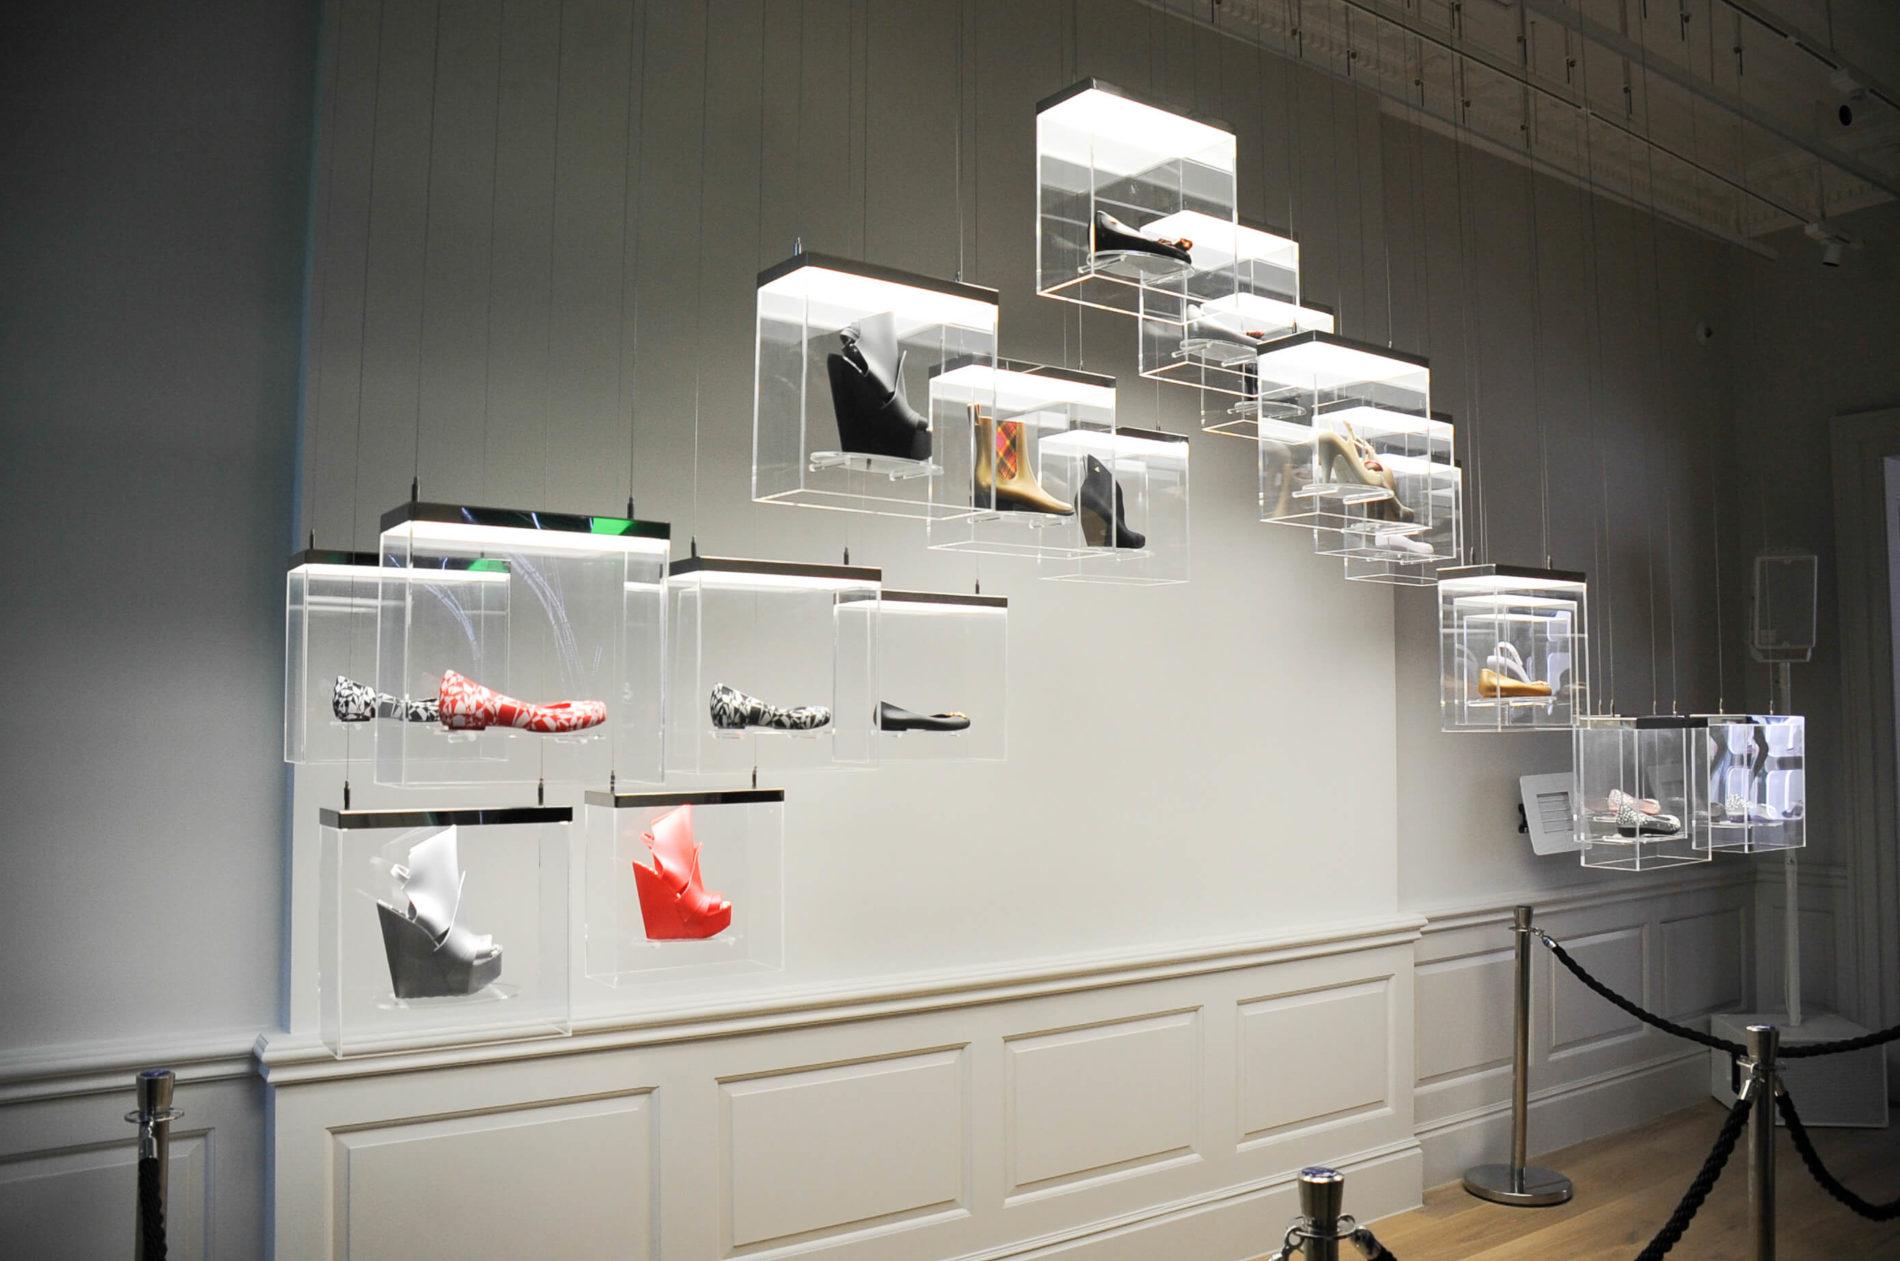 kinetic-sculpture-galeria-melisa-coven-garden-london-3-mjlighting